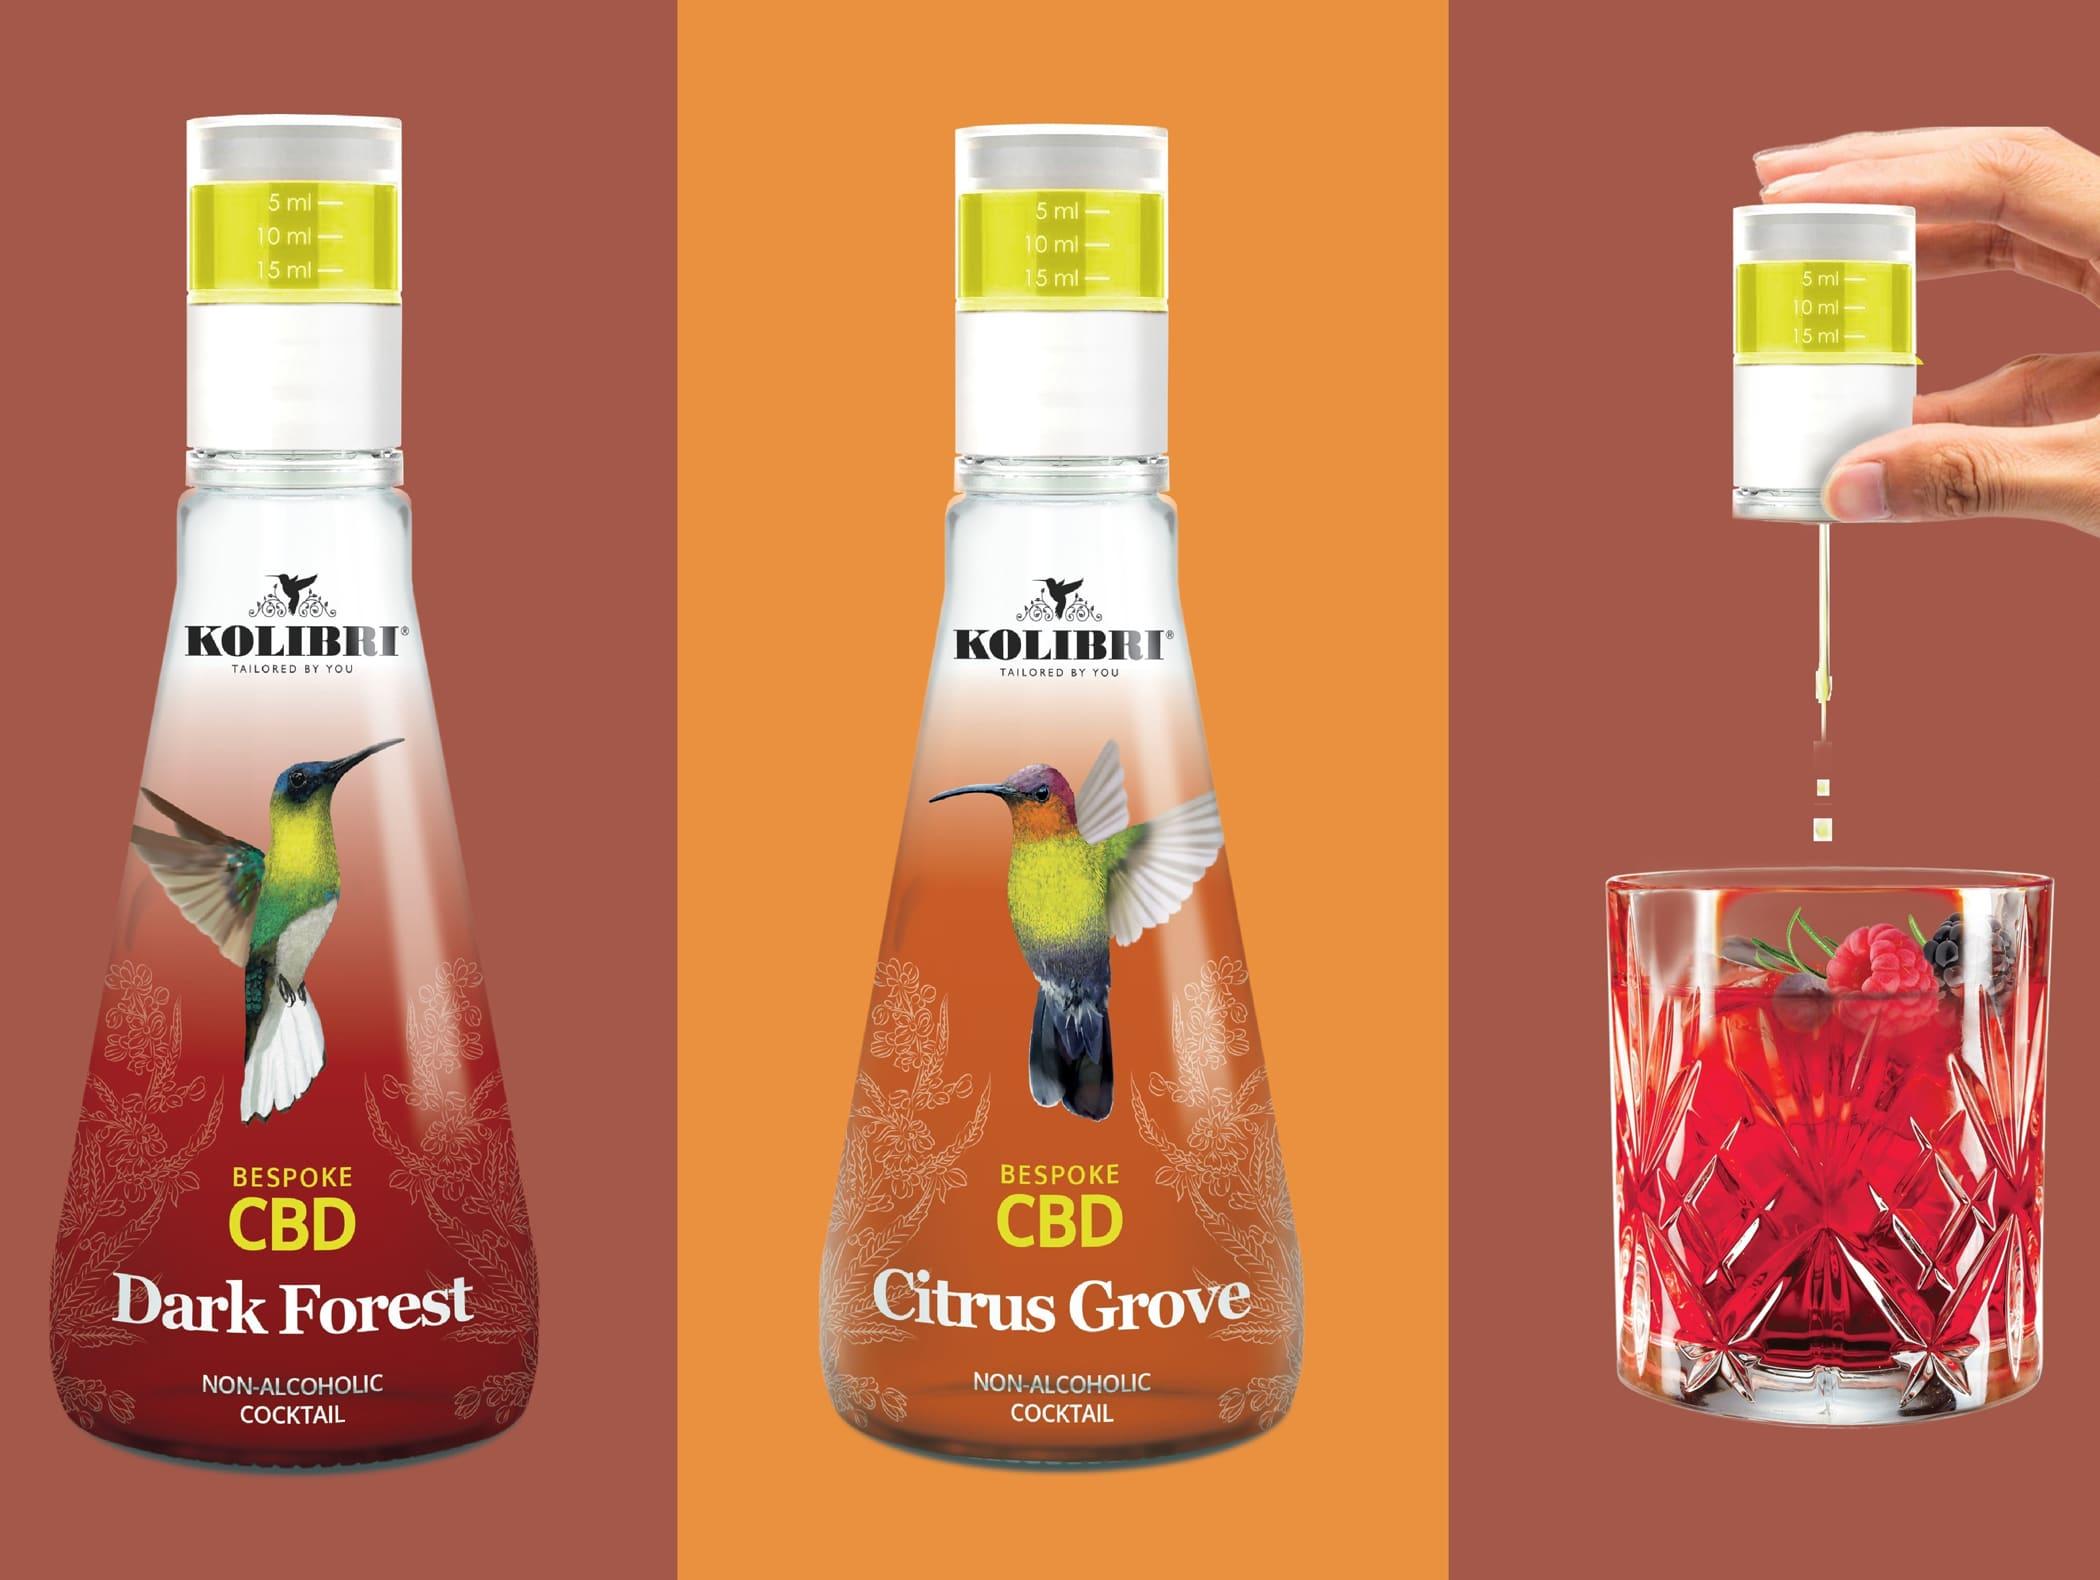 Kolibri CBD Drinks 2-Large-banner-2100px-by-1580px-min